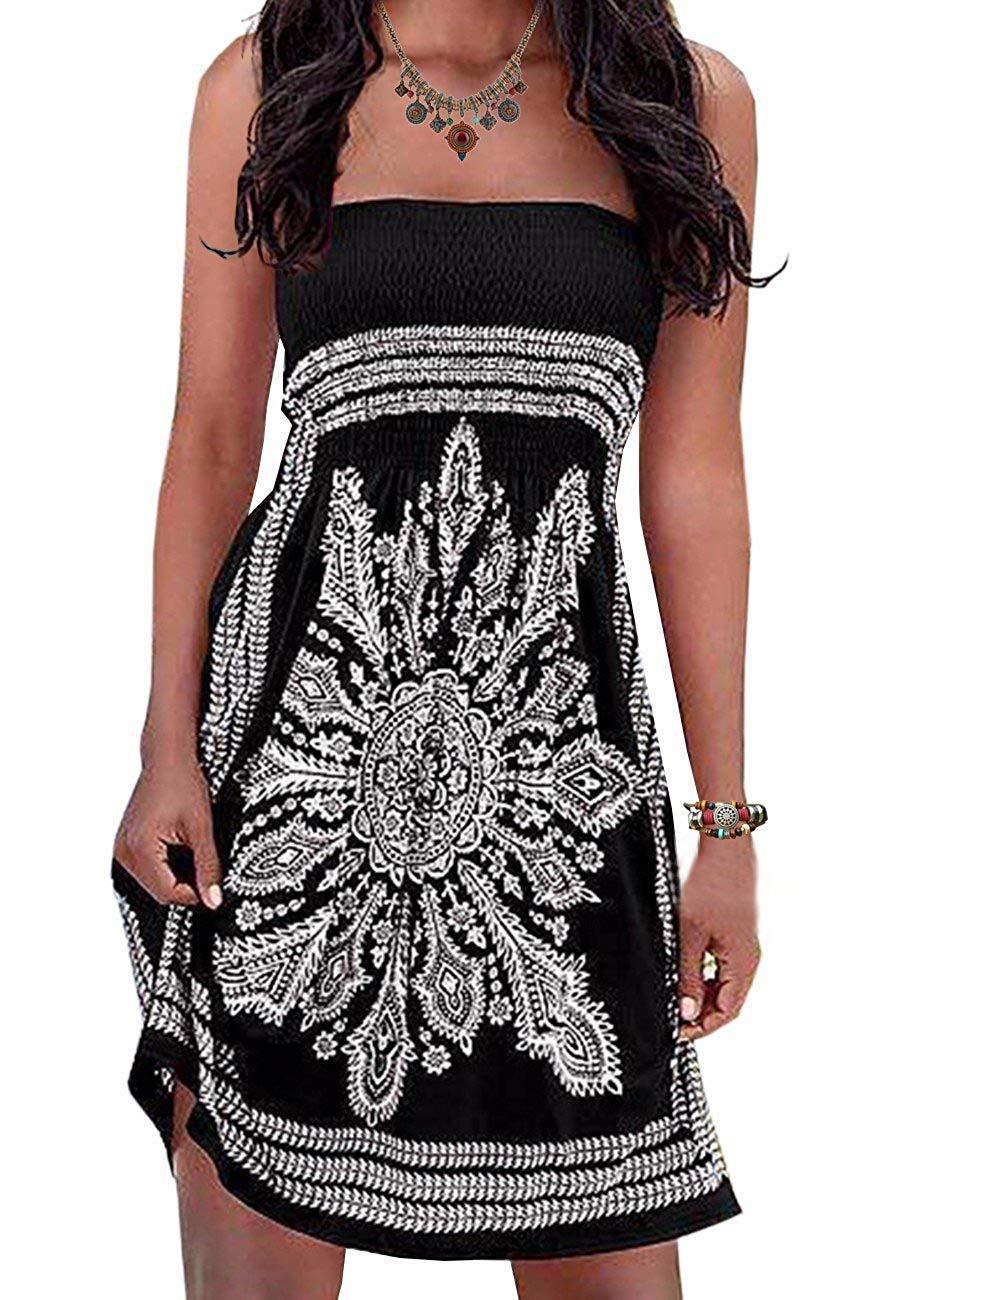 Initial Women's Strapleess Floral Print Bohemian Beach Dress Cover-up Dress $12.59